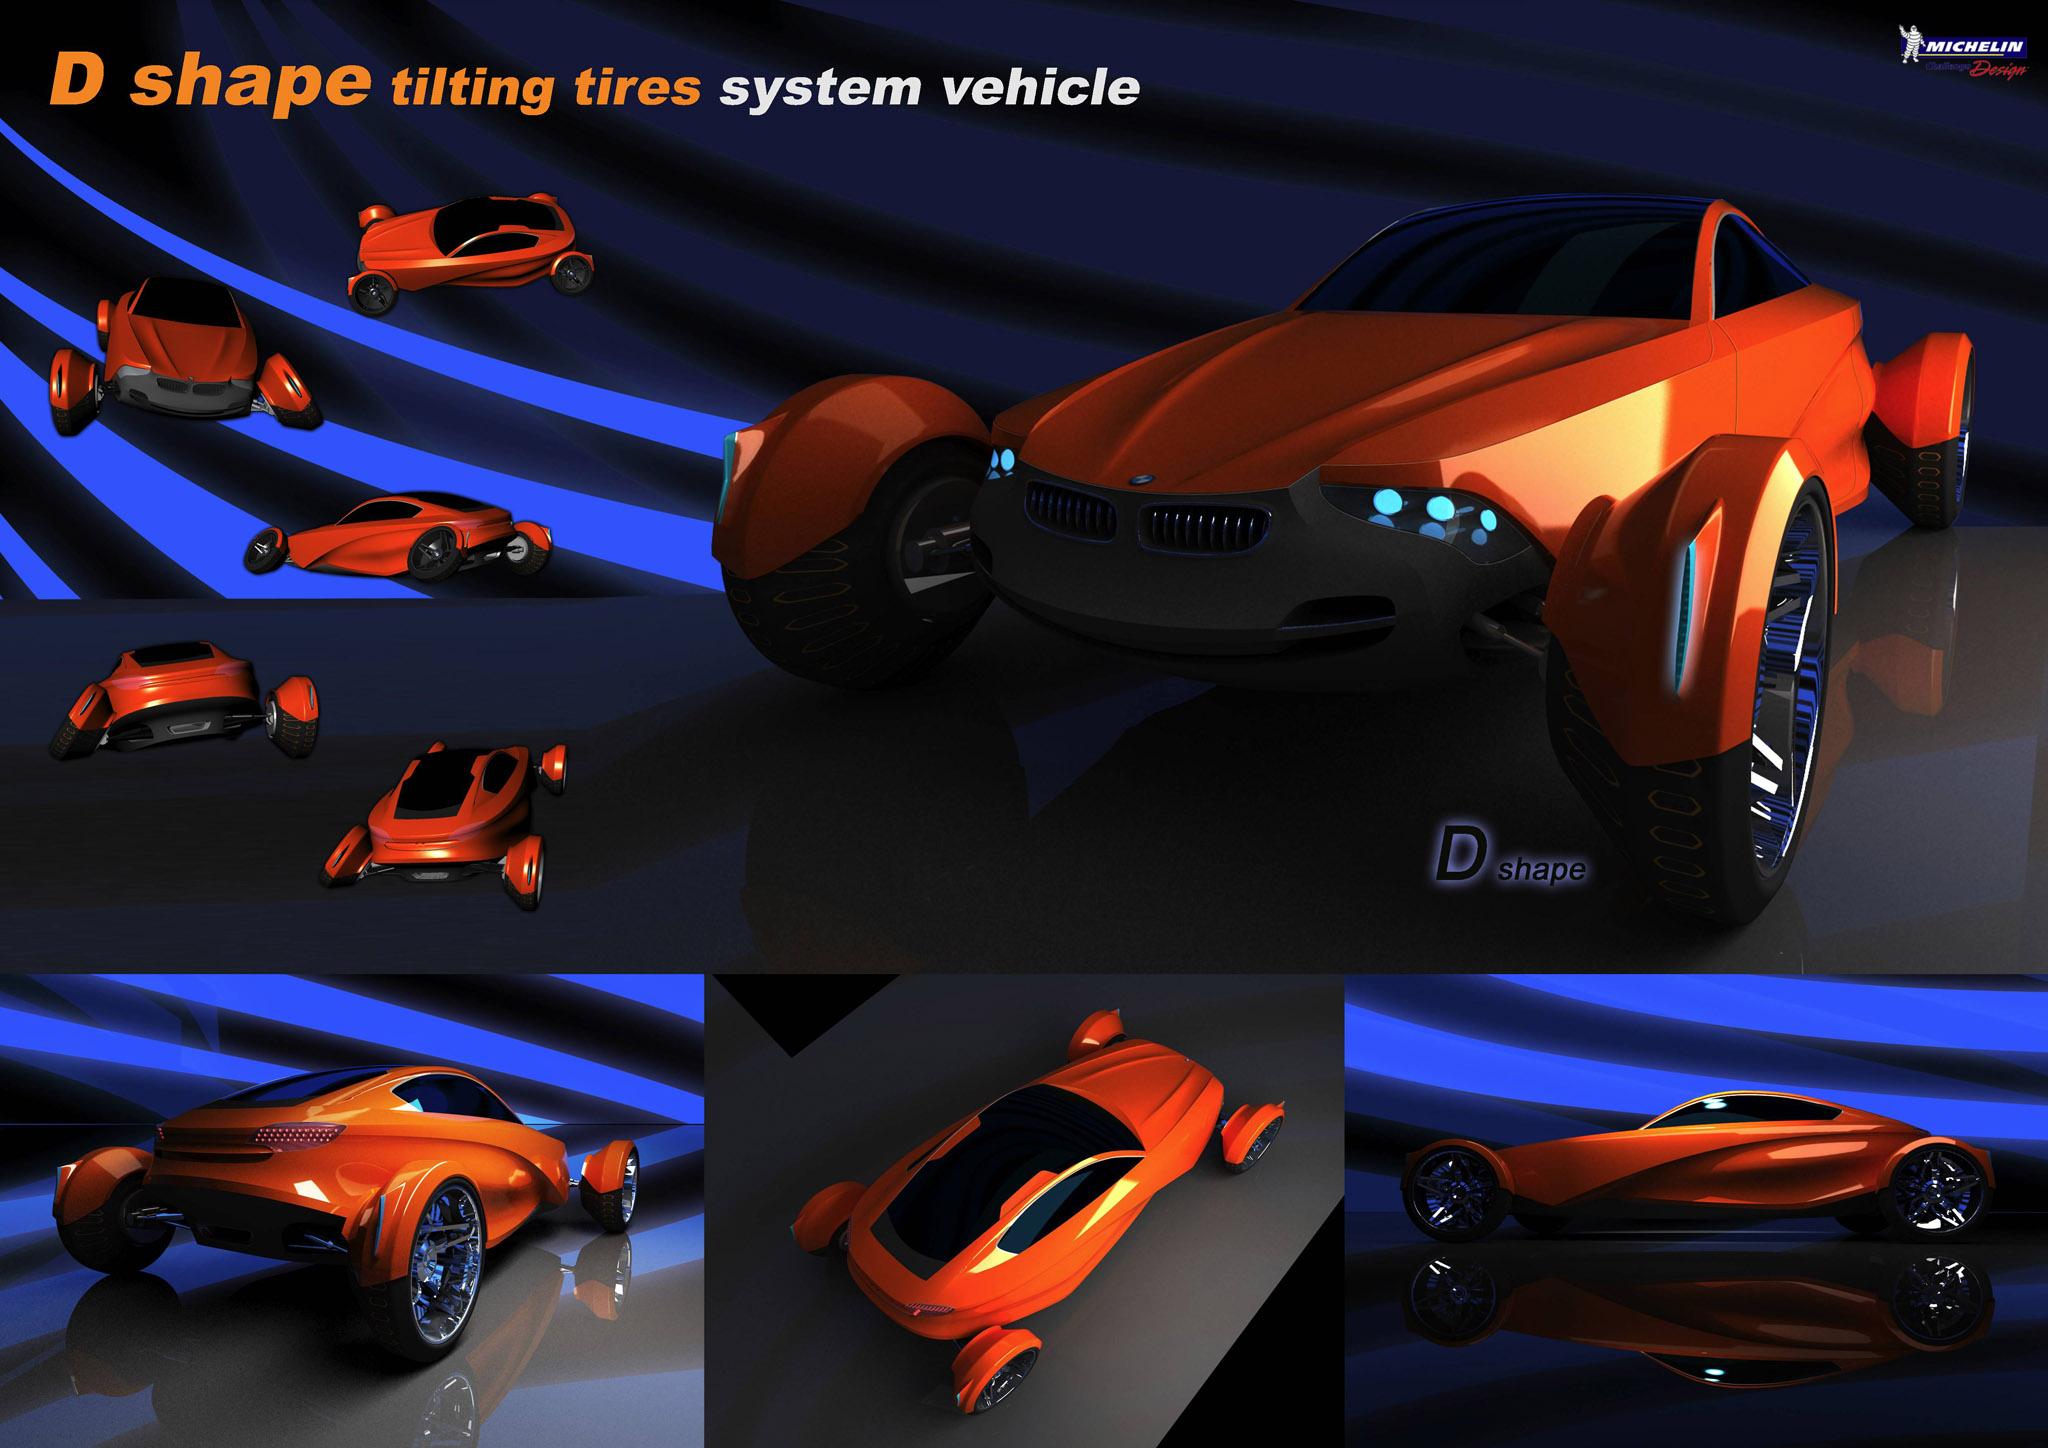 D Shape tilting tires system vehicle by HyukJun Seo, South